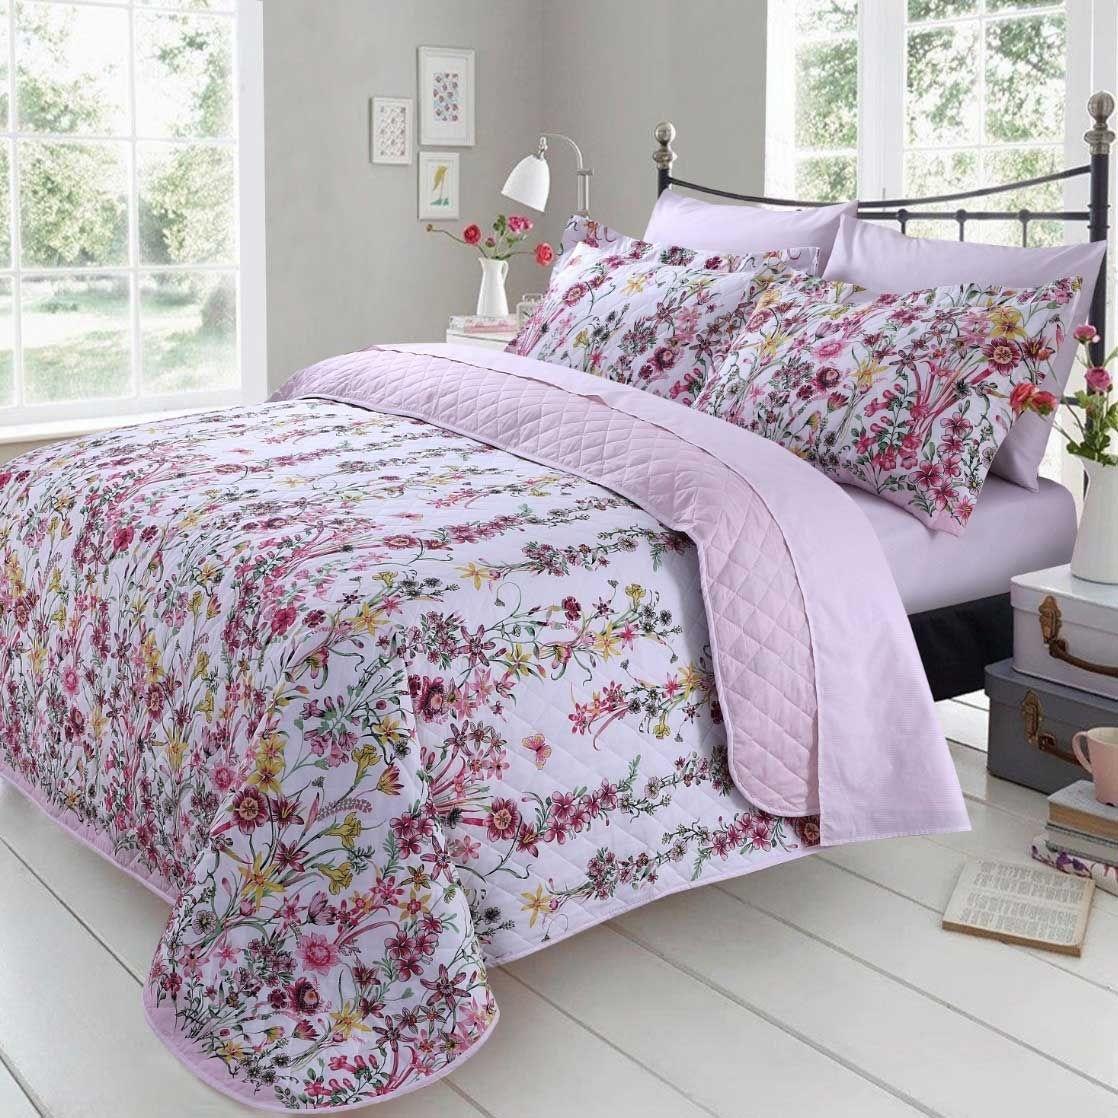 Bedspread & Blankets